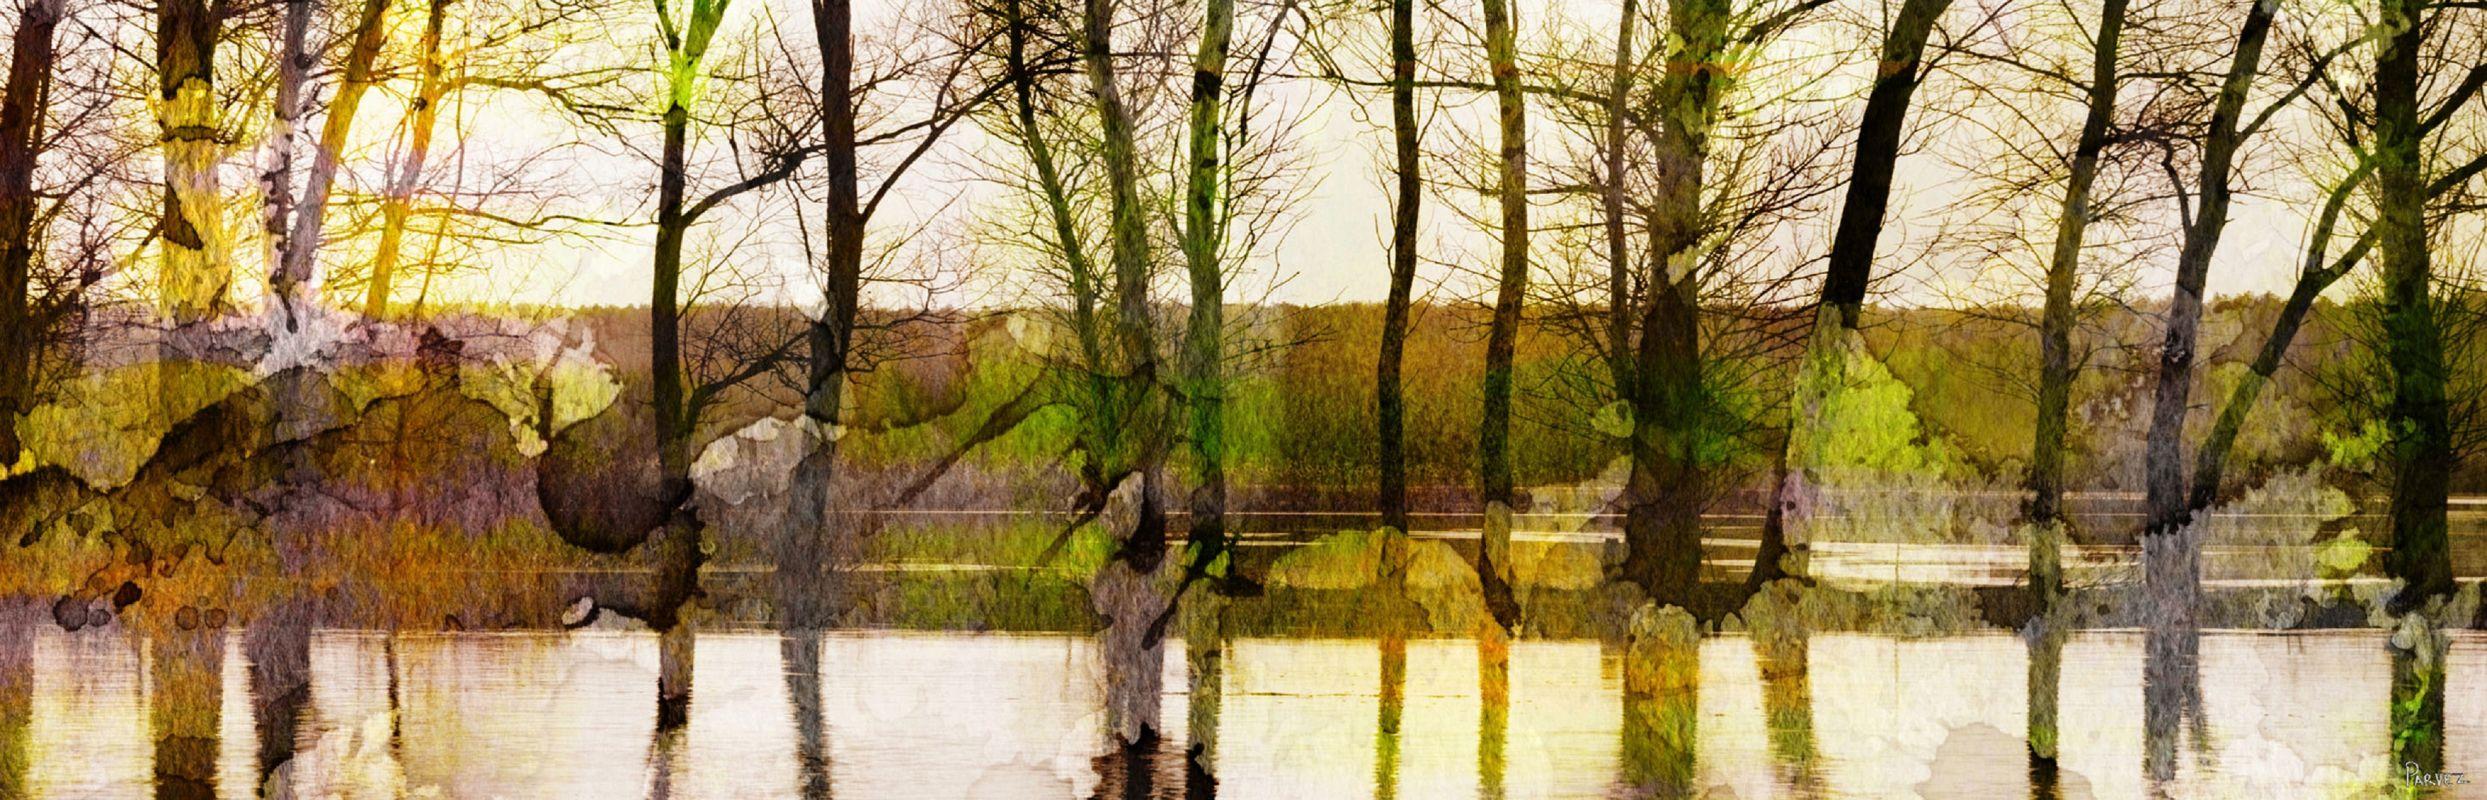 Parvez Taj Lake Trees Art Print on Premium Canvas 15 x 45 Home Decor